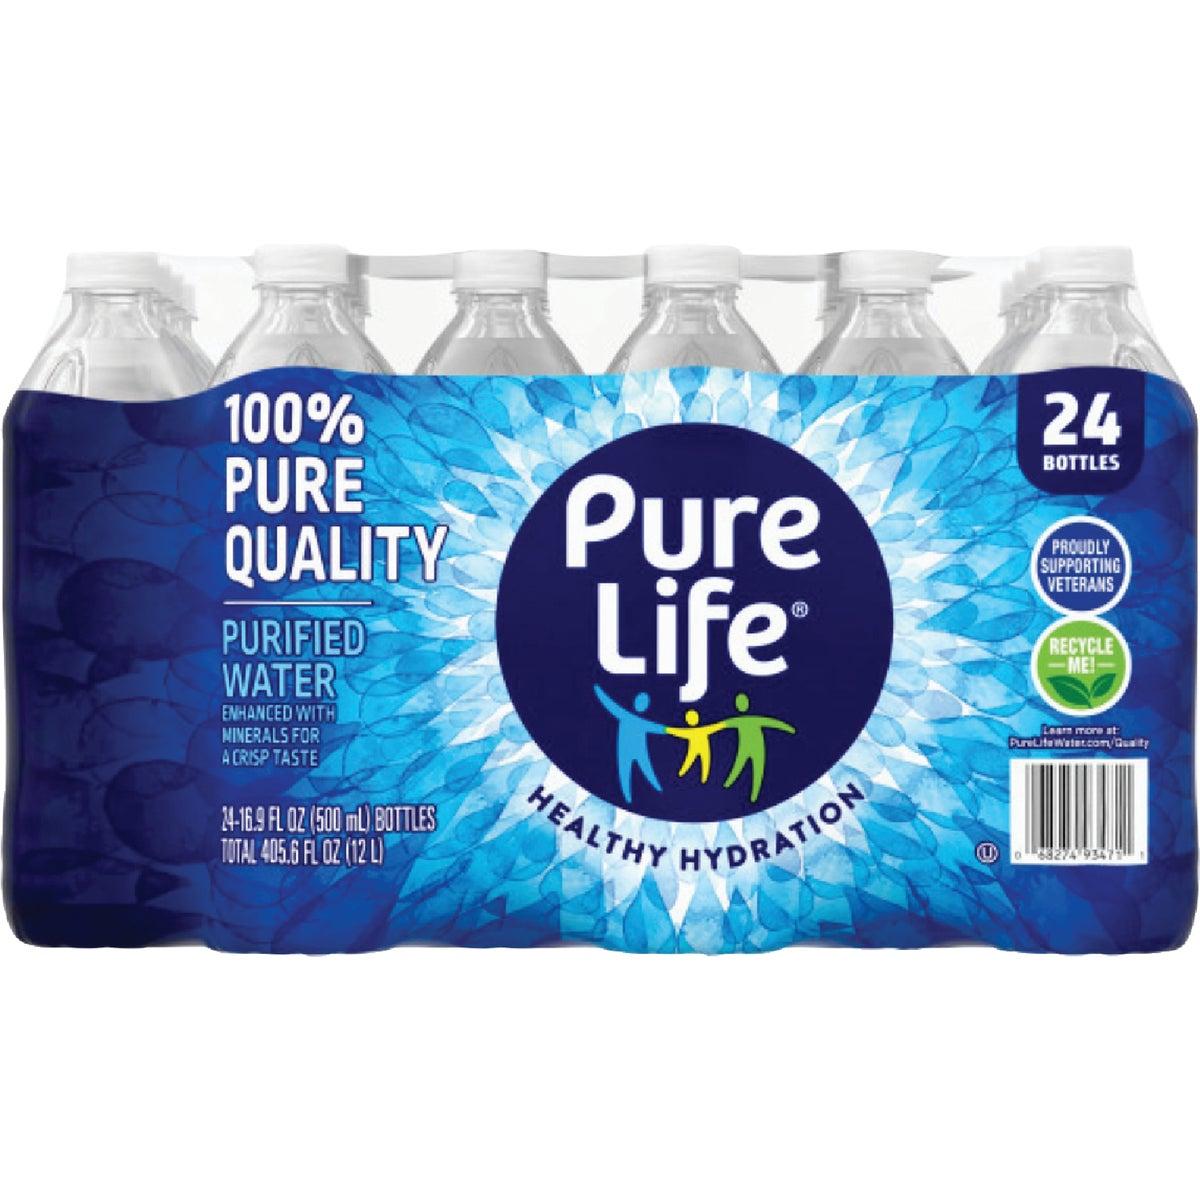 24PK .5L NPL WATER